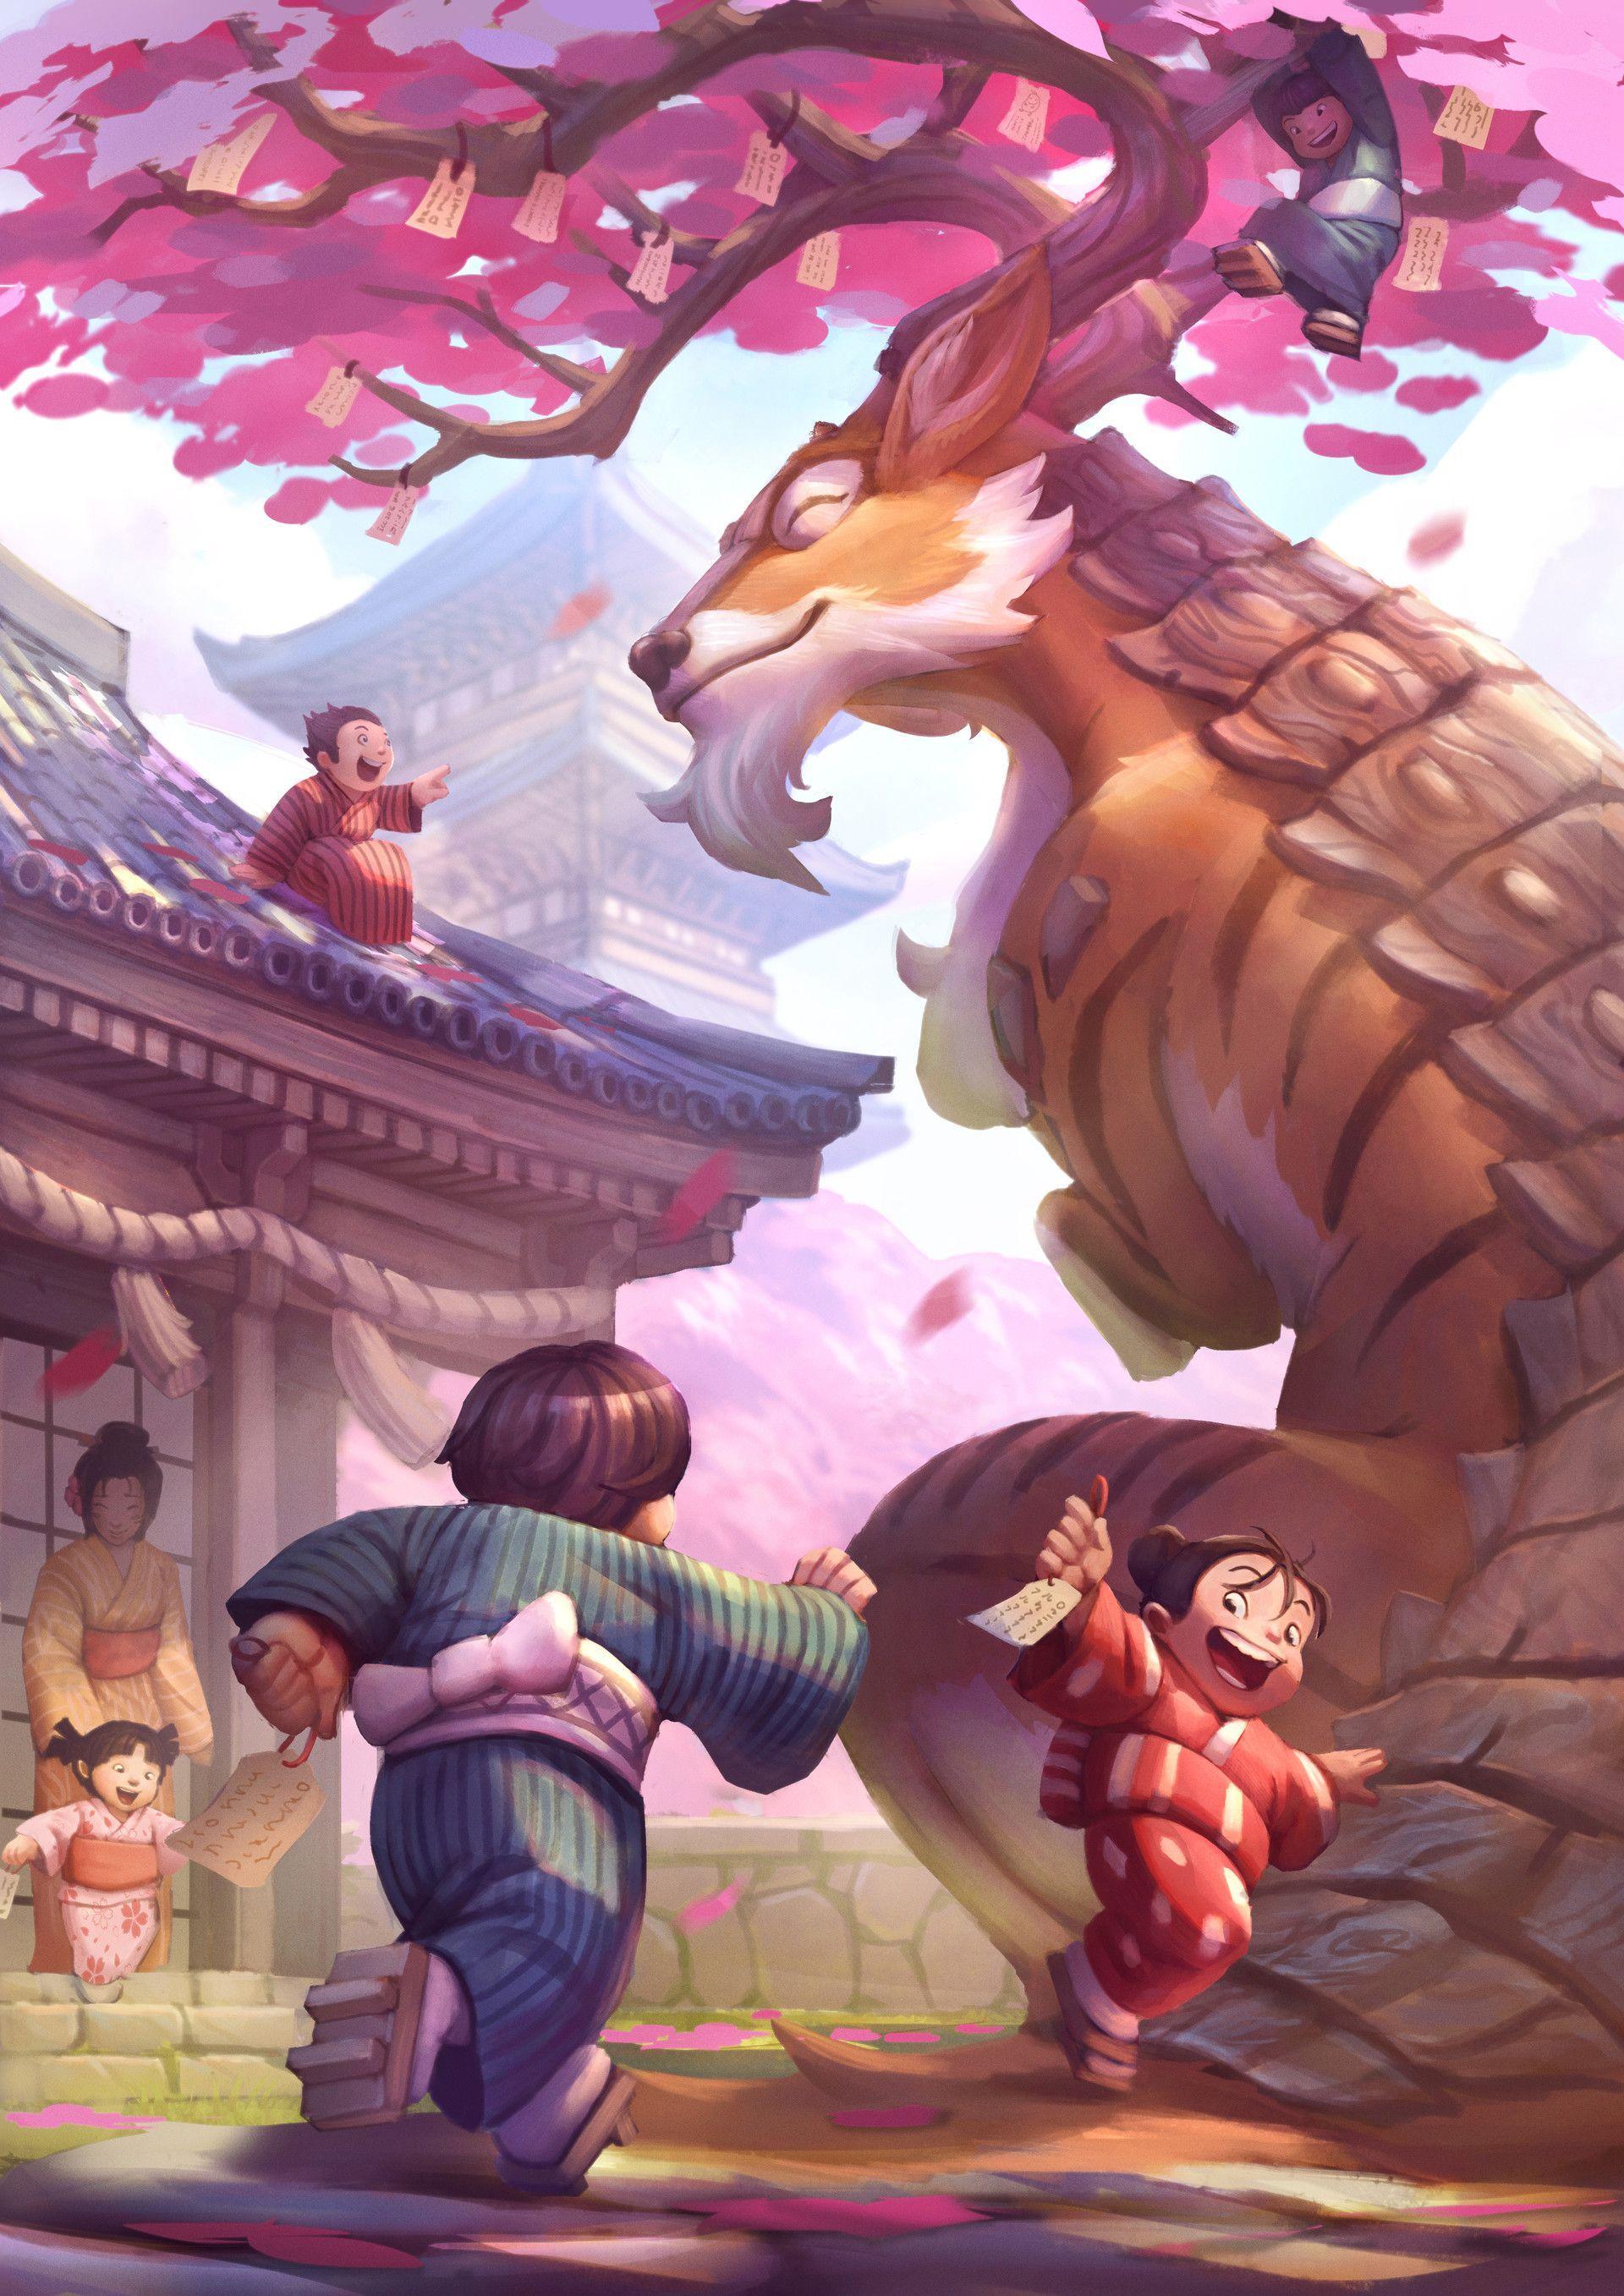 Time For Some Tea Kotaku Uk Arte Fantastico Dragones Dibujos